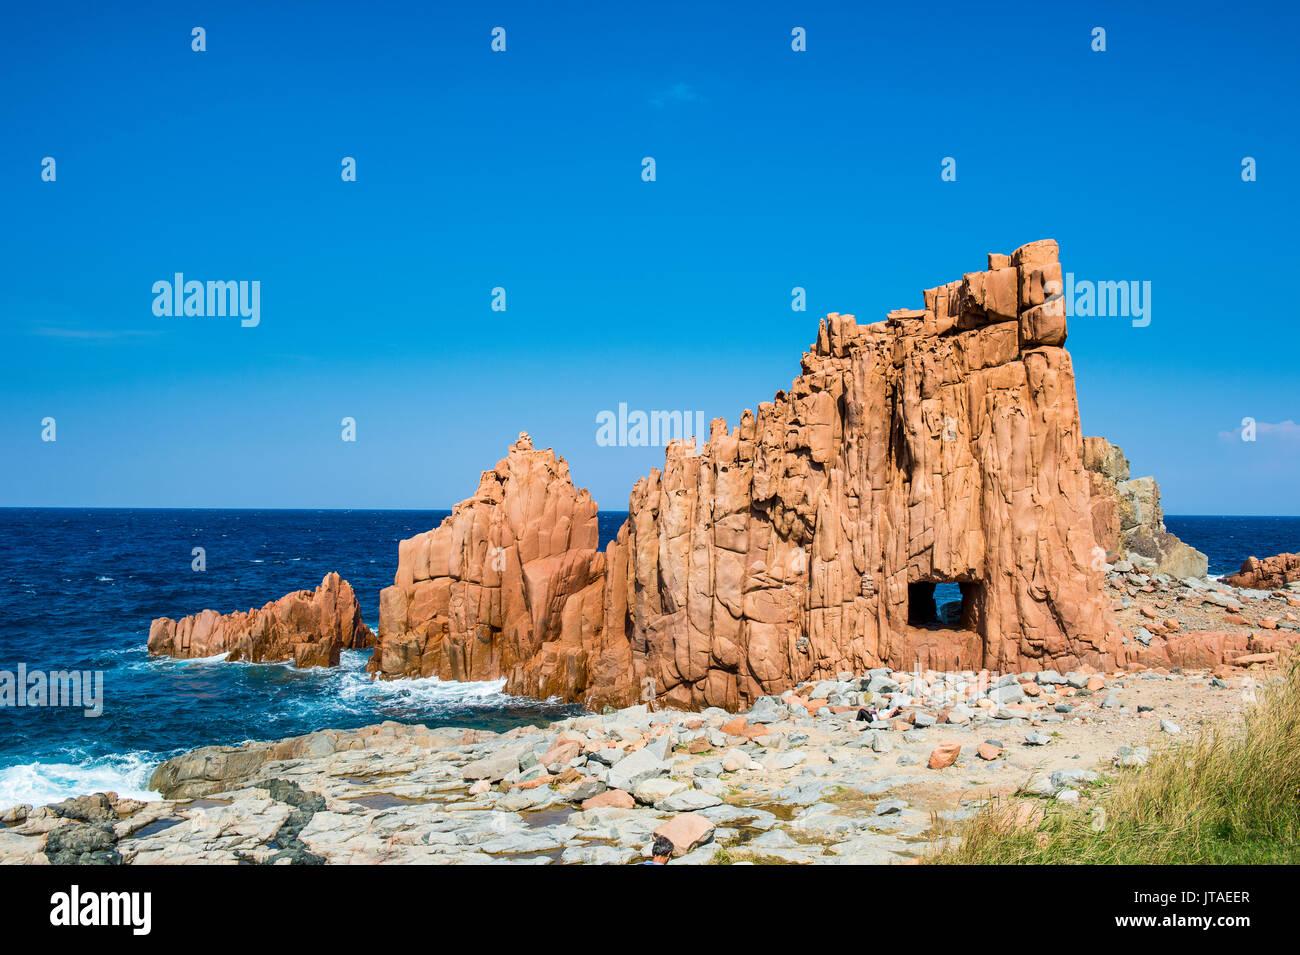 Playa de Rocce Rosse, Arbatax, Cerdeña, Italia, Mediterráneo, Europa Imagen De Stock